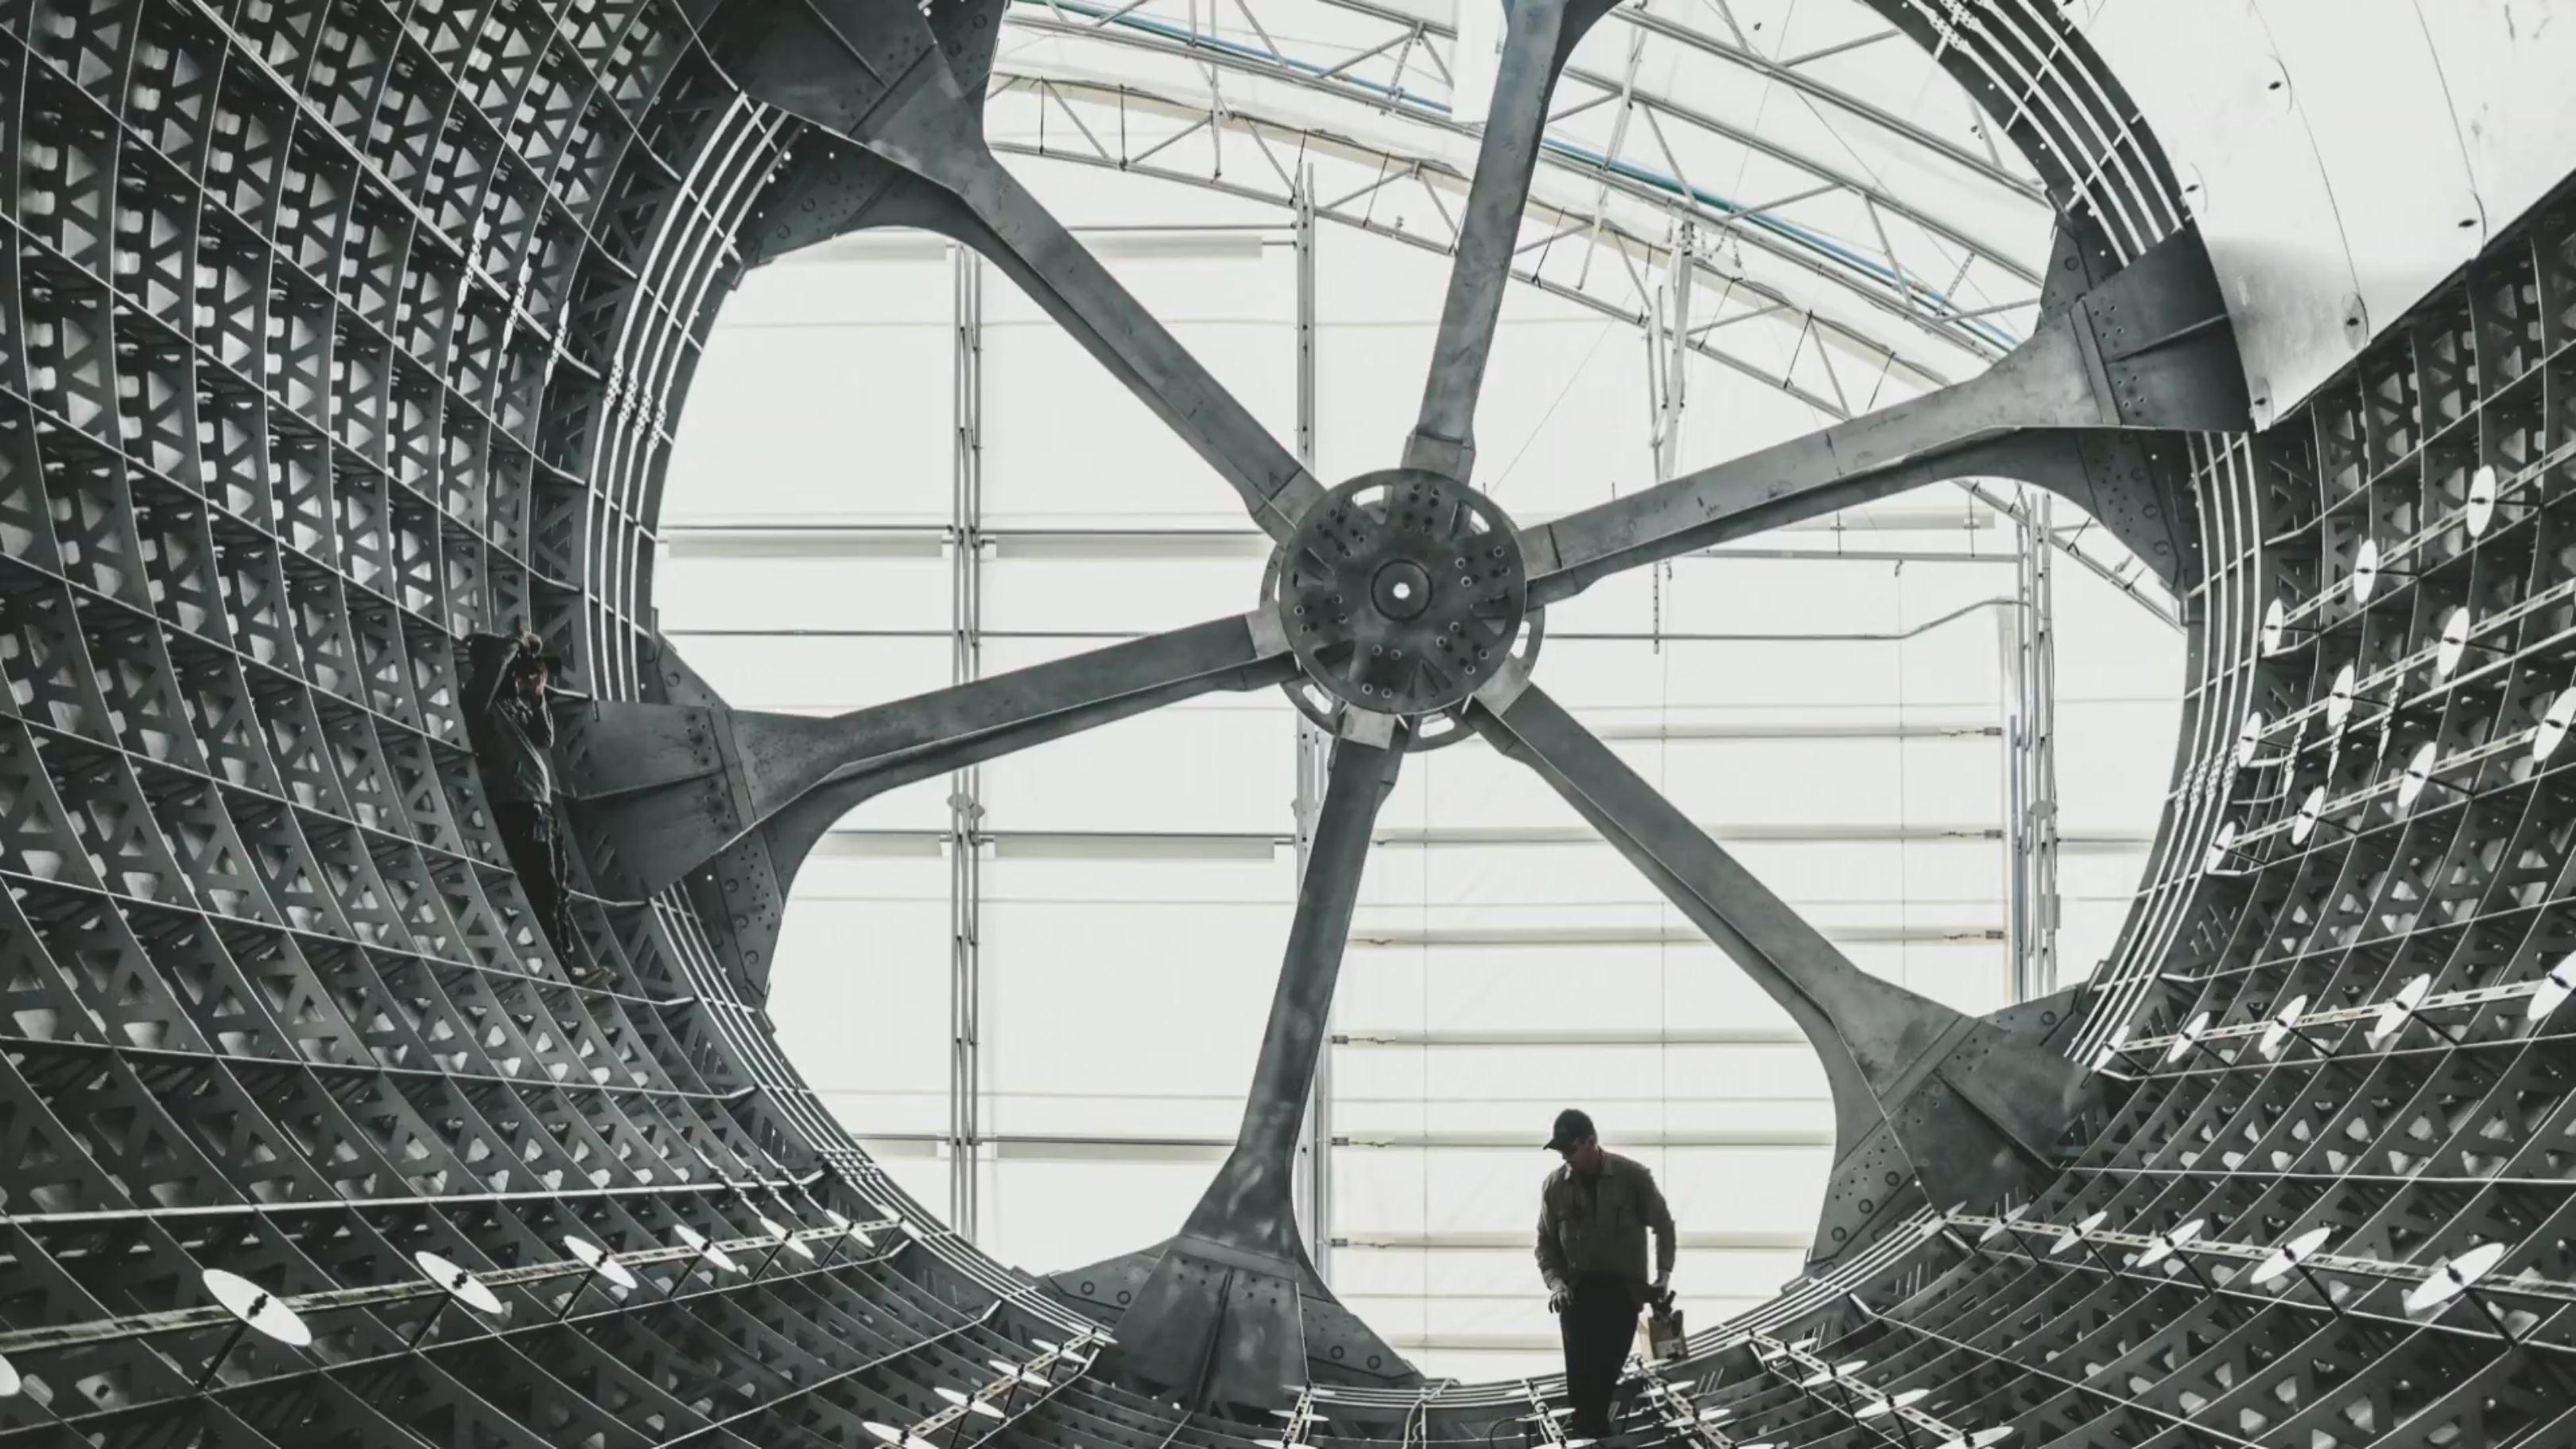 BFR mandrel composite production (SpaceX) 1